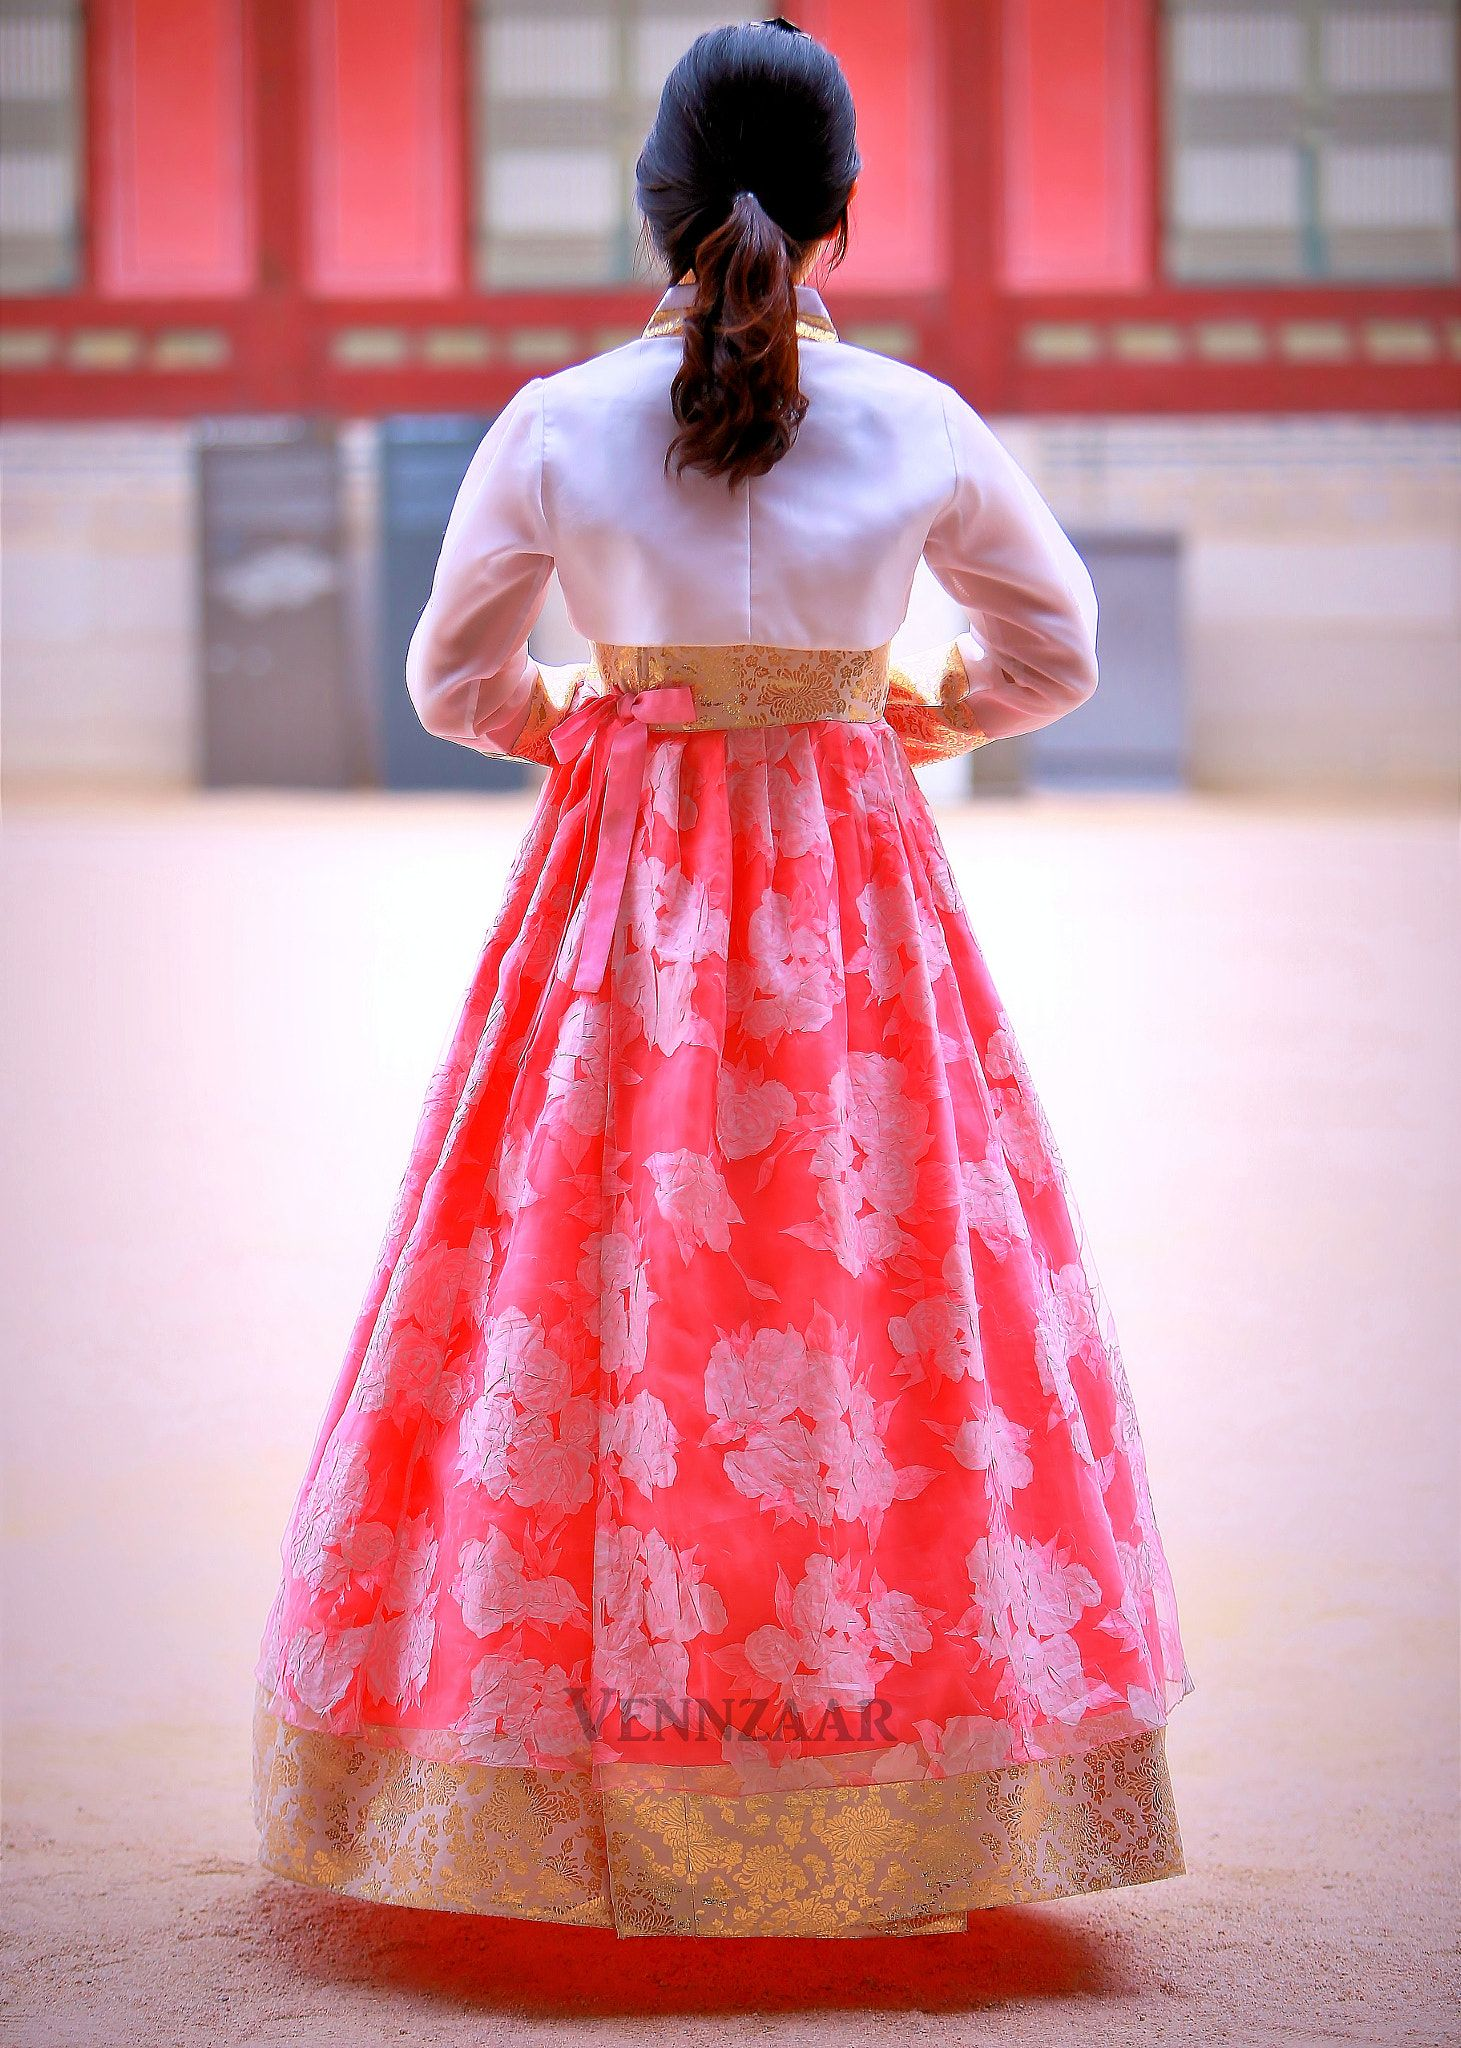 Pink Hanbok Hanbok Hanbok South Korea Or Joseon Ot North Korea Is The Traditional Korean Dress It Is Often Traditional Korean Dress Hanbok Korean Dress